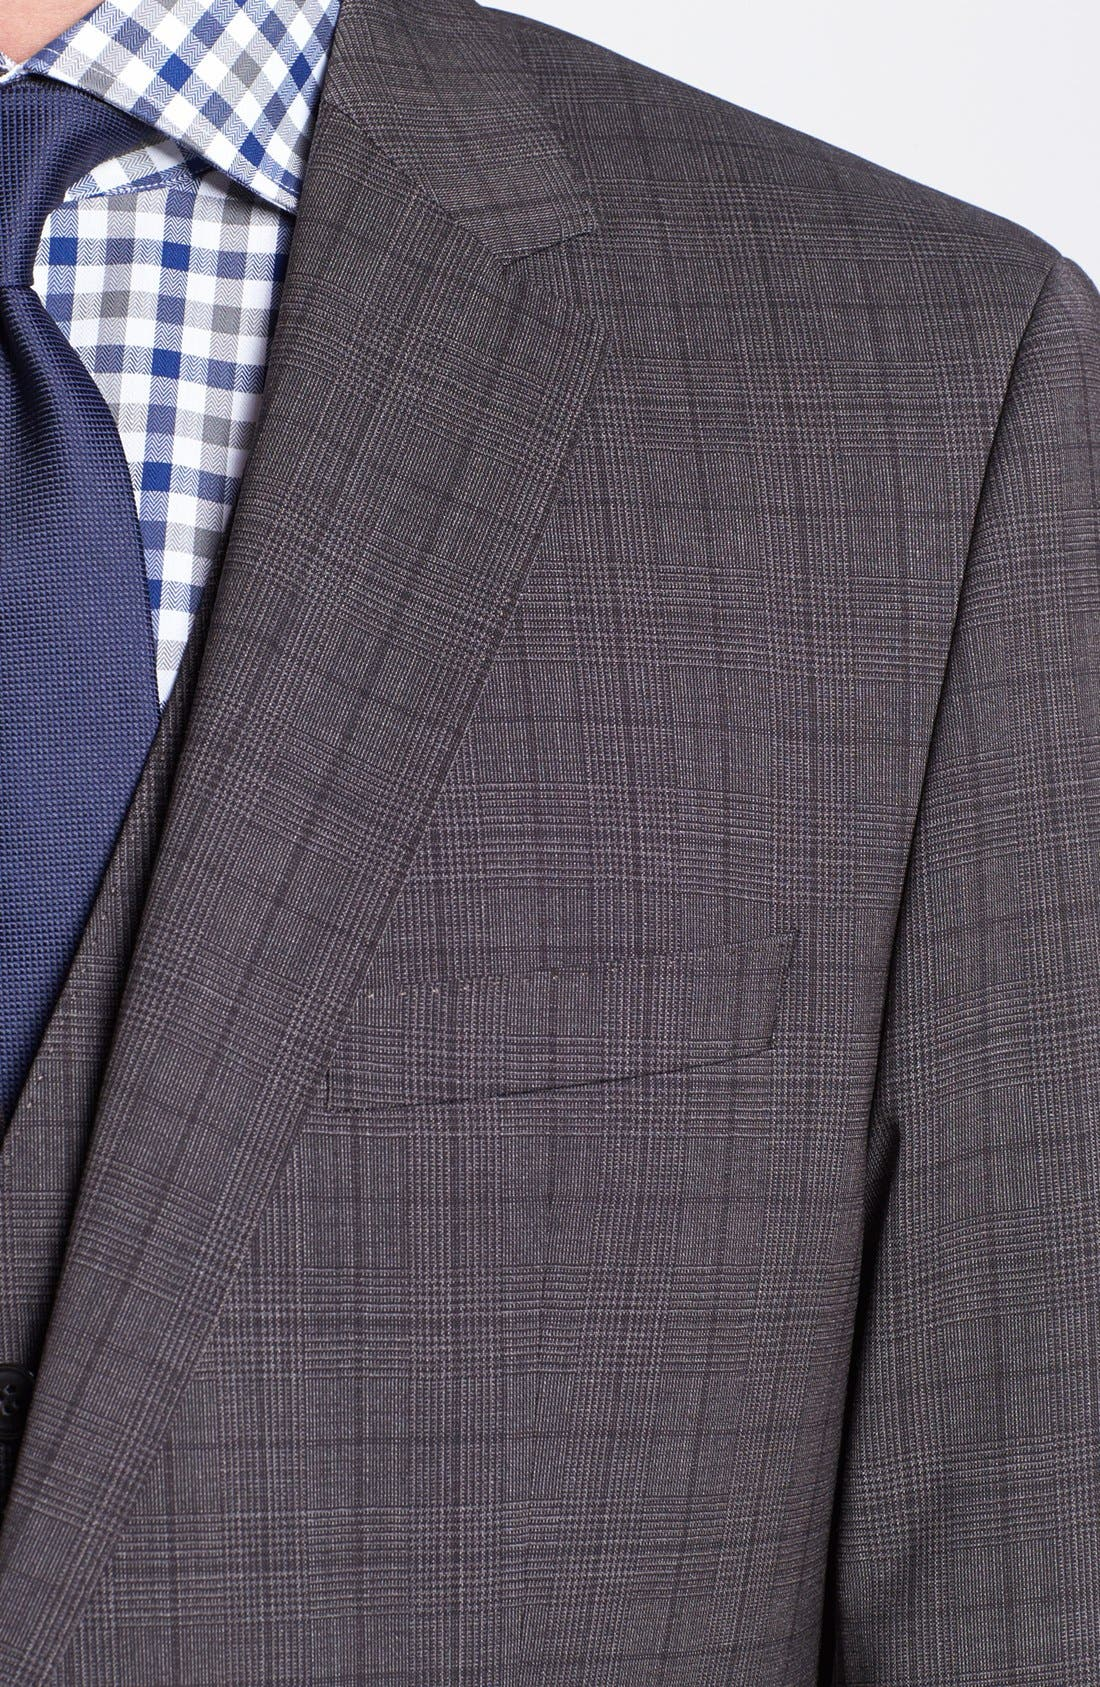 Alternate Image 3  - BOSS HUGO BOSS 'James/Sharp' Trim Fit Three Piece Plaid Suit